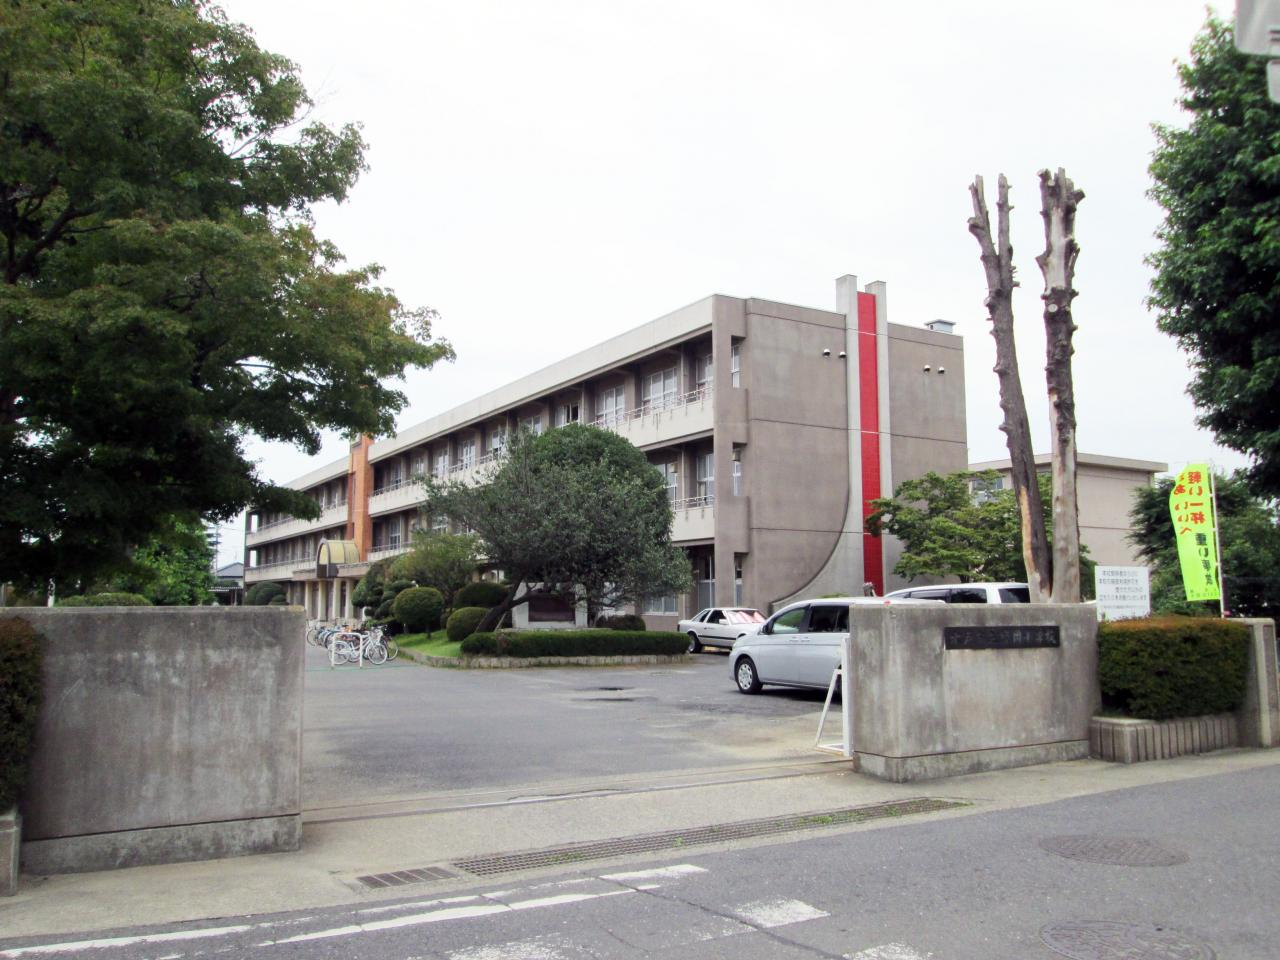 土地 水戸市千波町 JR常磐線(取手〜いわき)水戸駅 1200万円